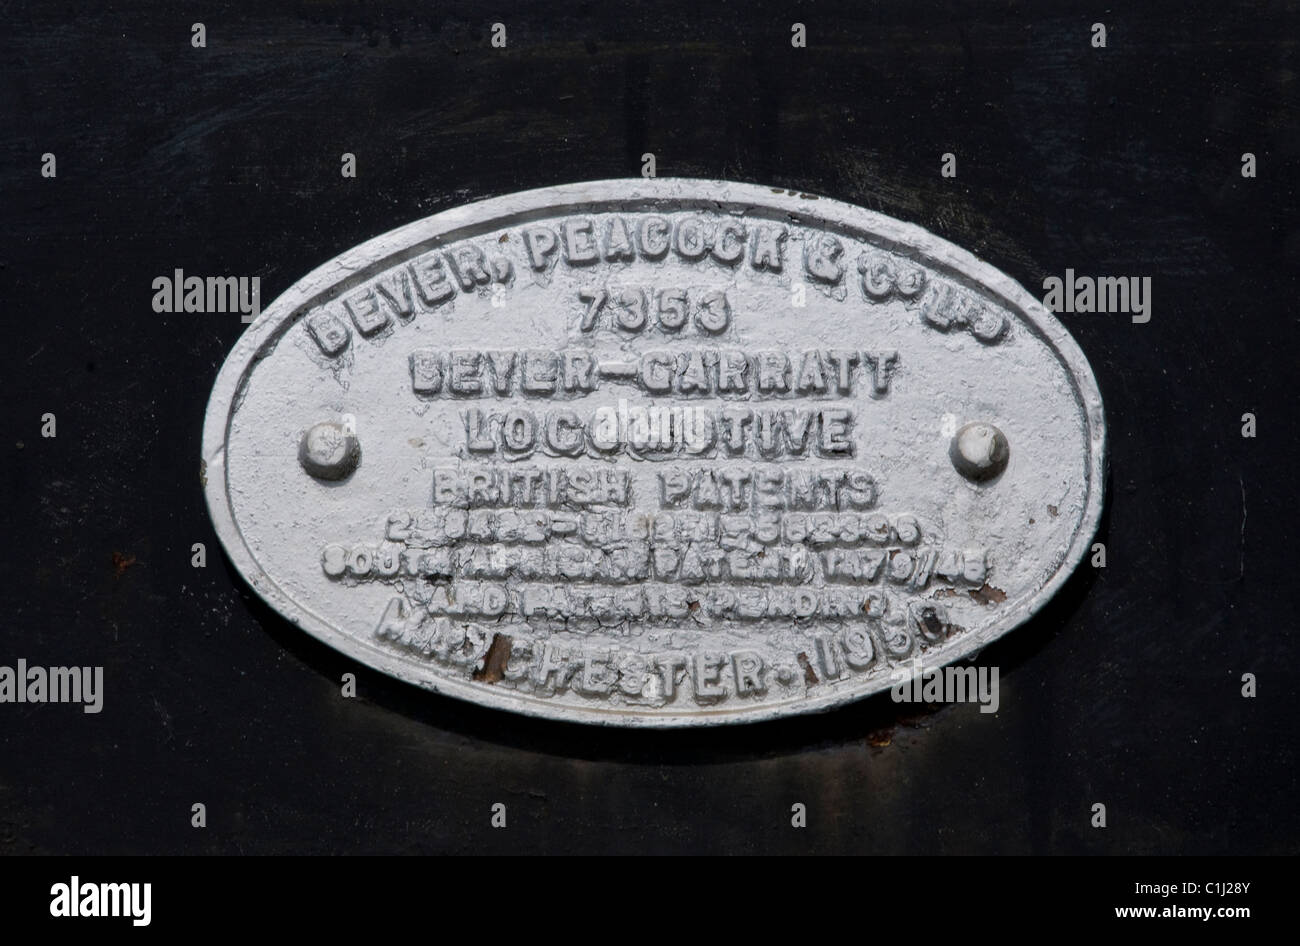 beyer-peacock and co.ltd. manchester , beyer-garratt locomotive , maker's plate  livingstone railway museum - Stock Image